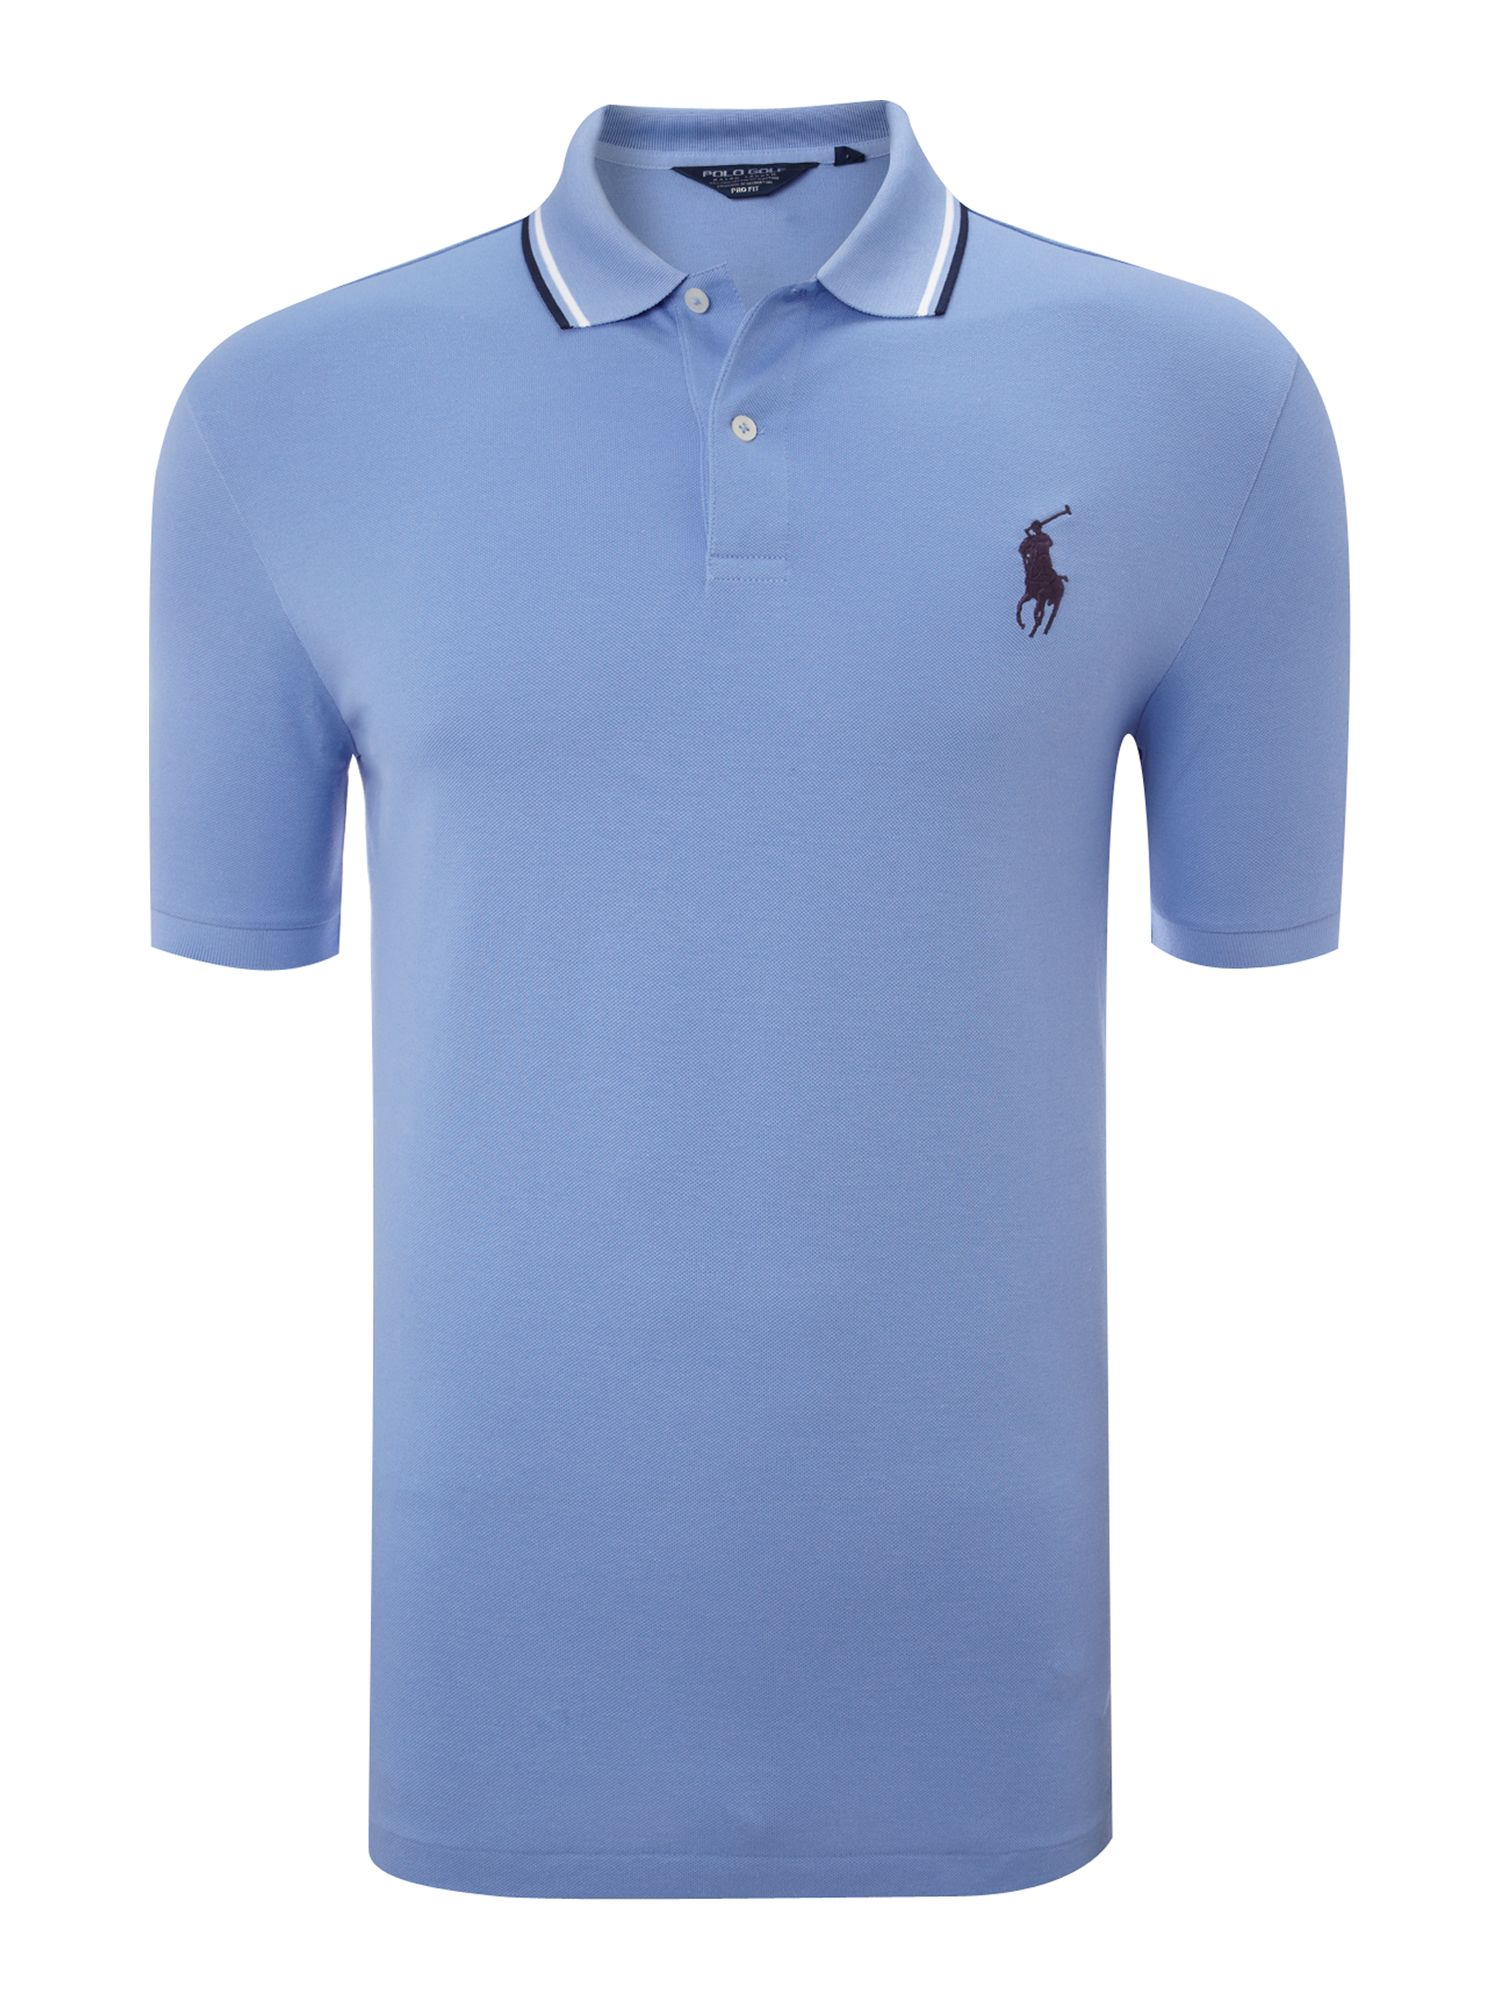 Lyst Ralph Lauren Golf Big Pony Short Sleeve Polo Shirt